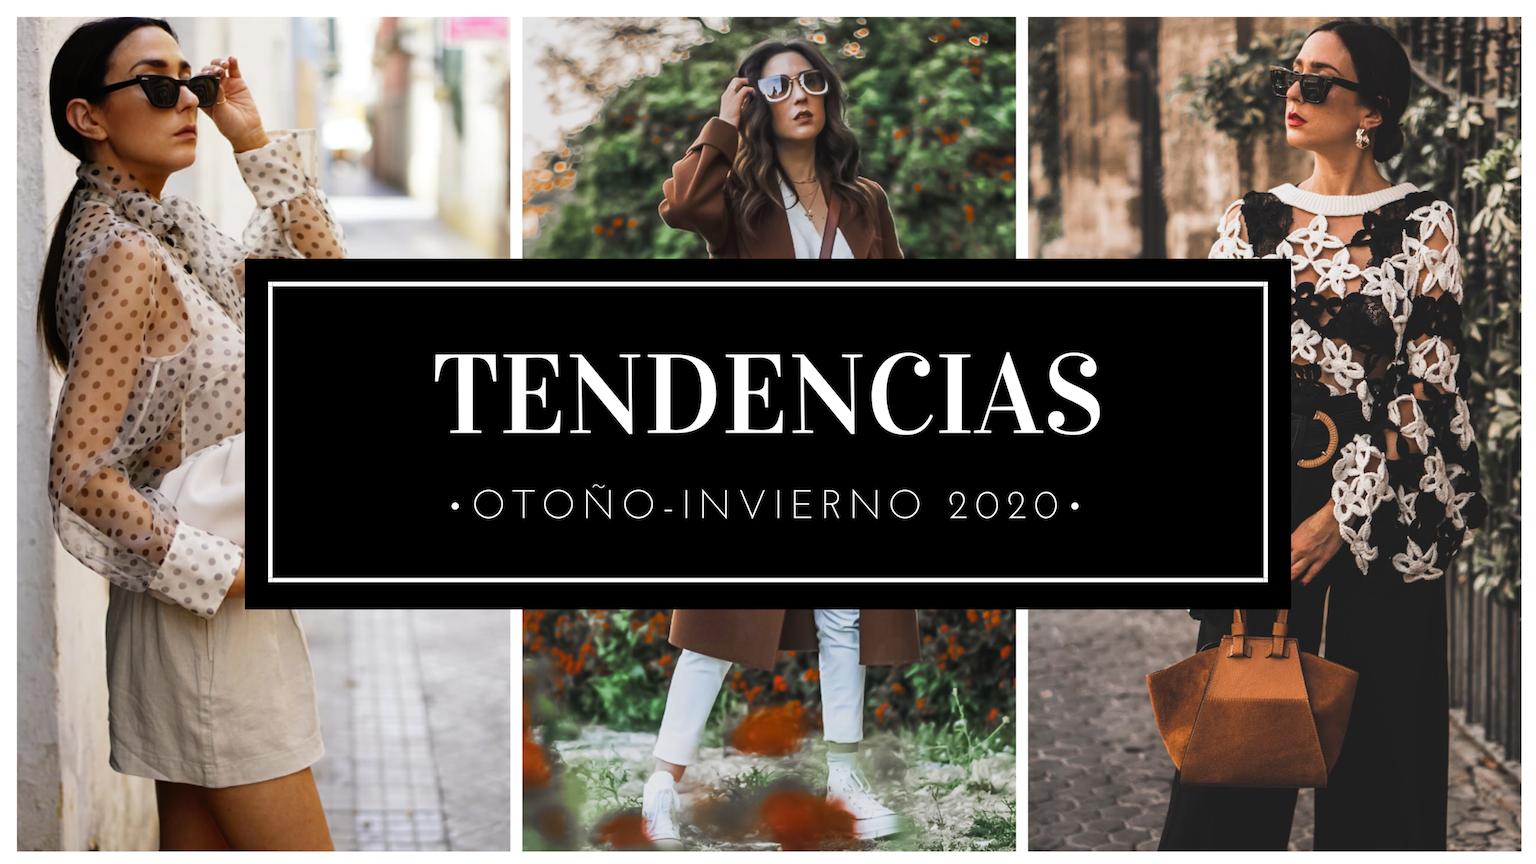 tendencias otoño invierno 2019 2020